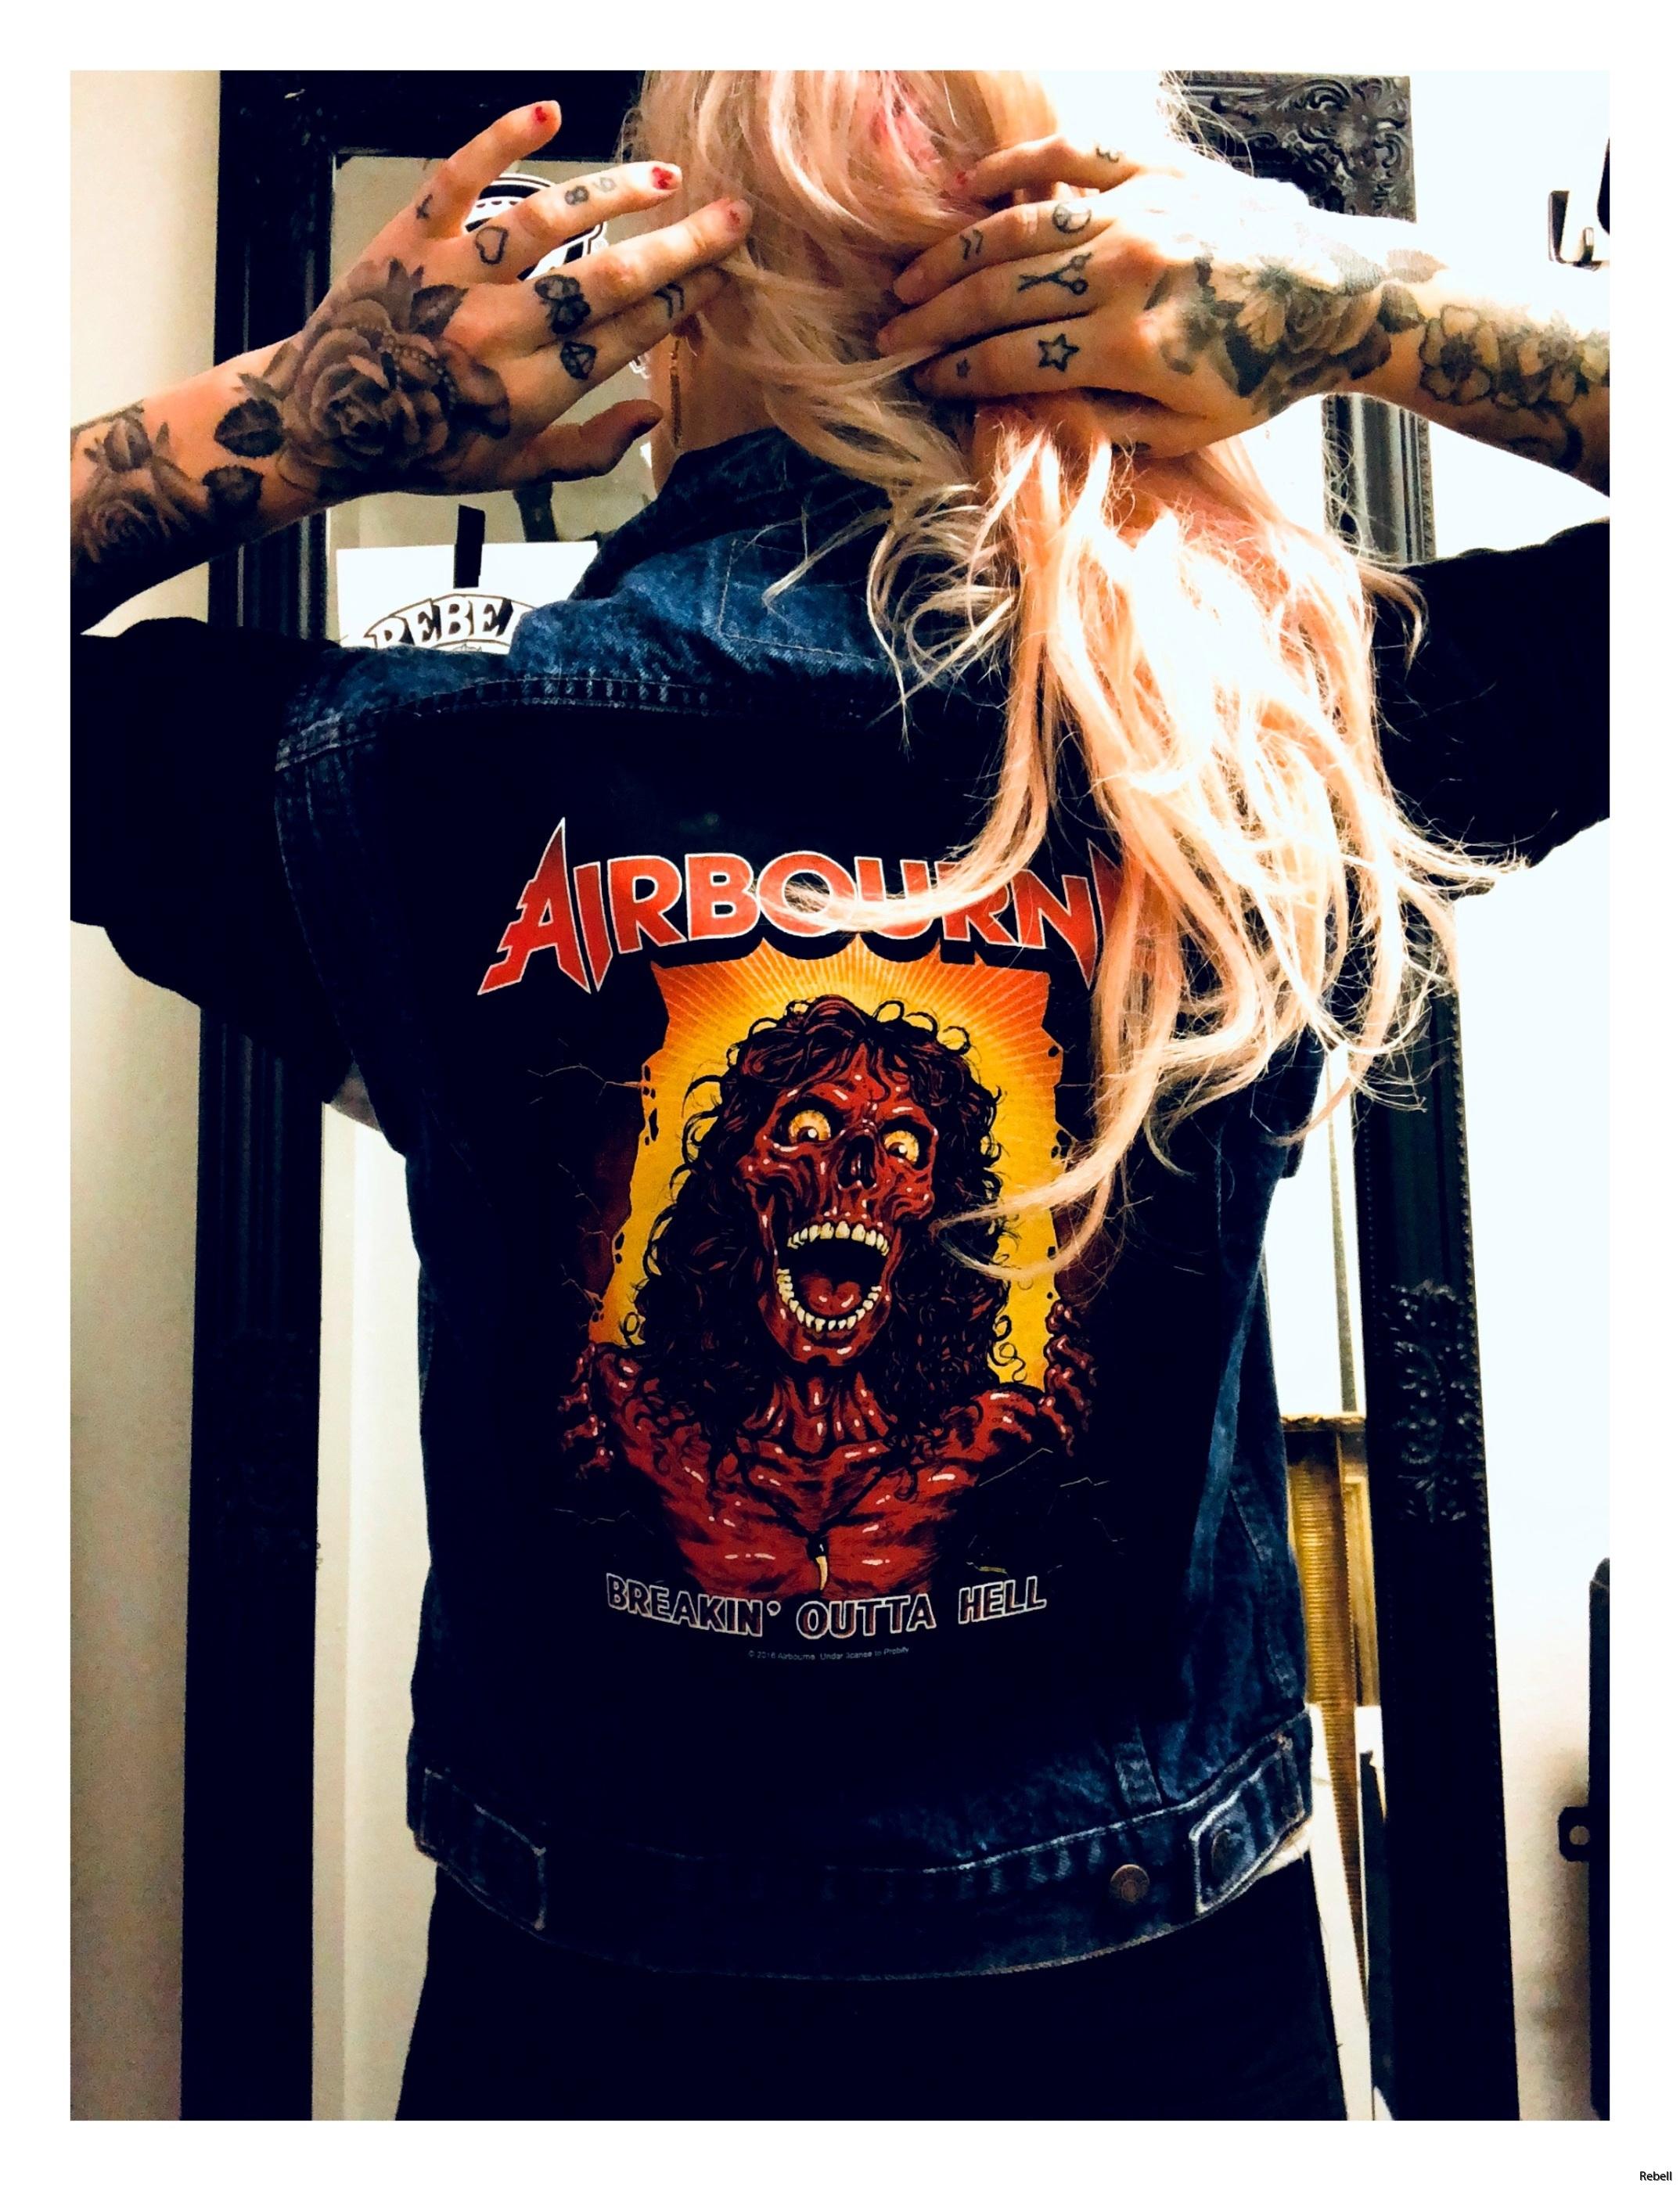 Airbourne Junk Jeansväst REbell rock rocknroll art design punk oi music rocknroll rockabilly